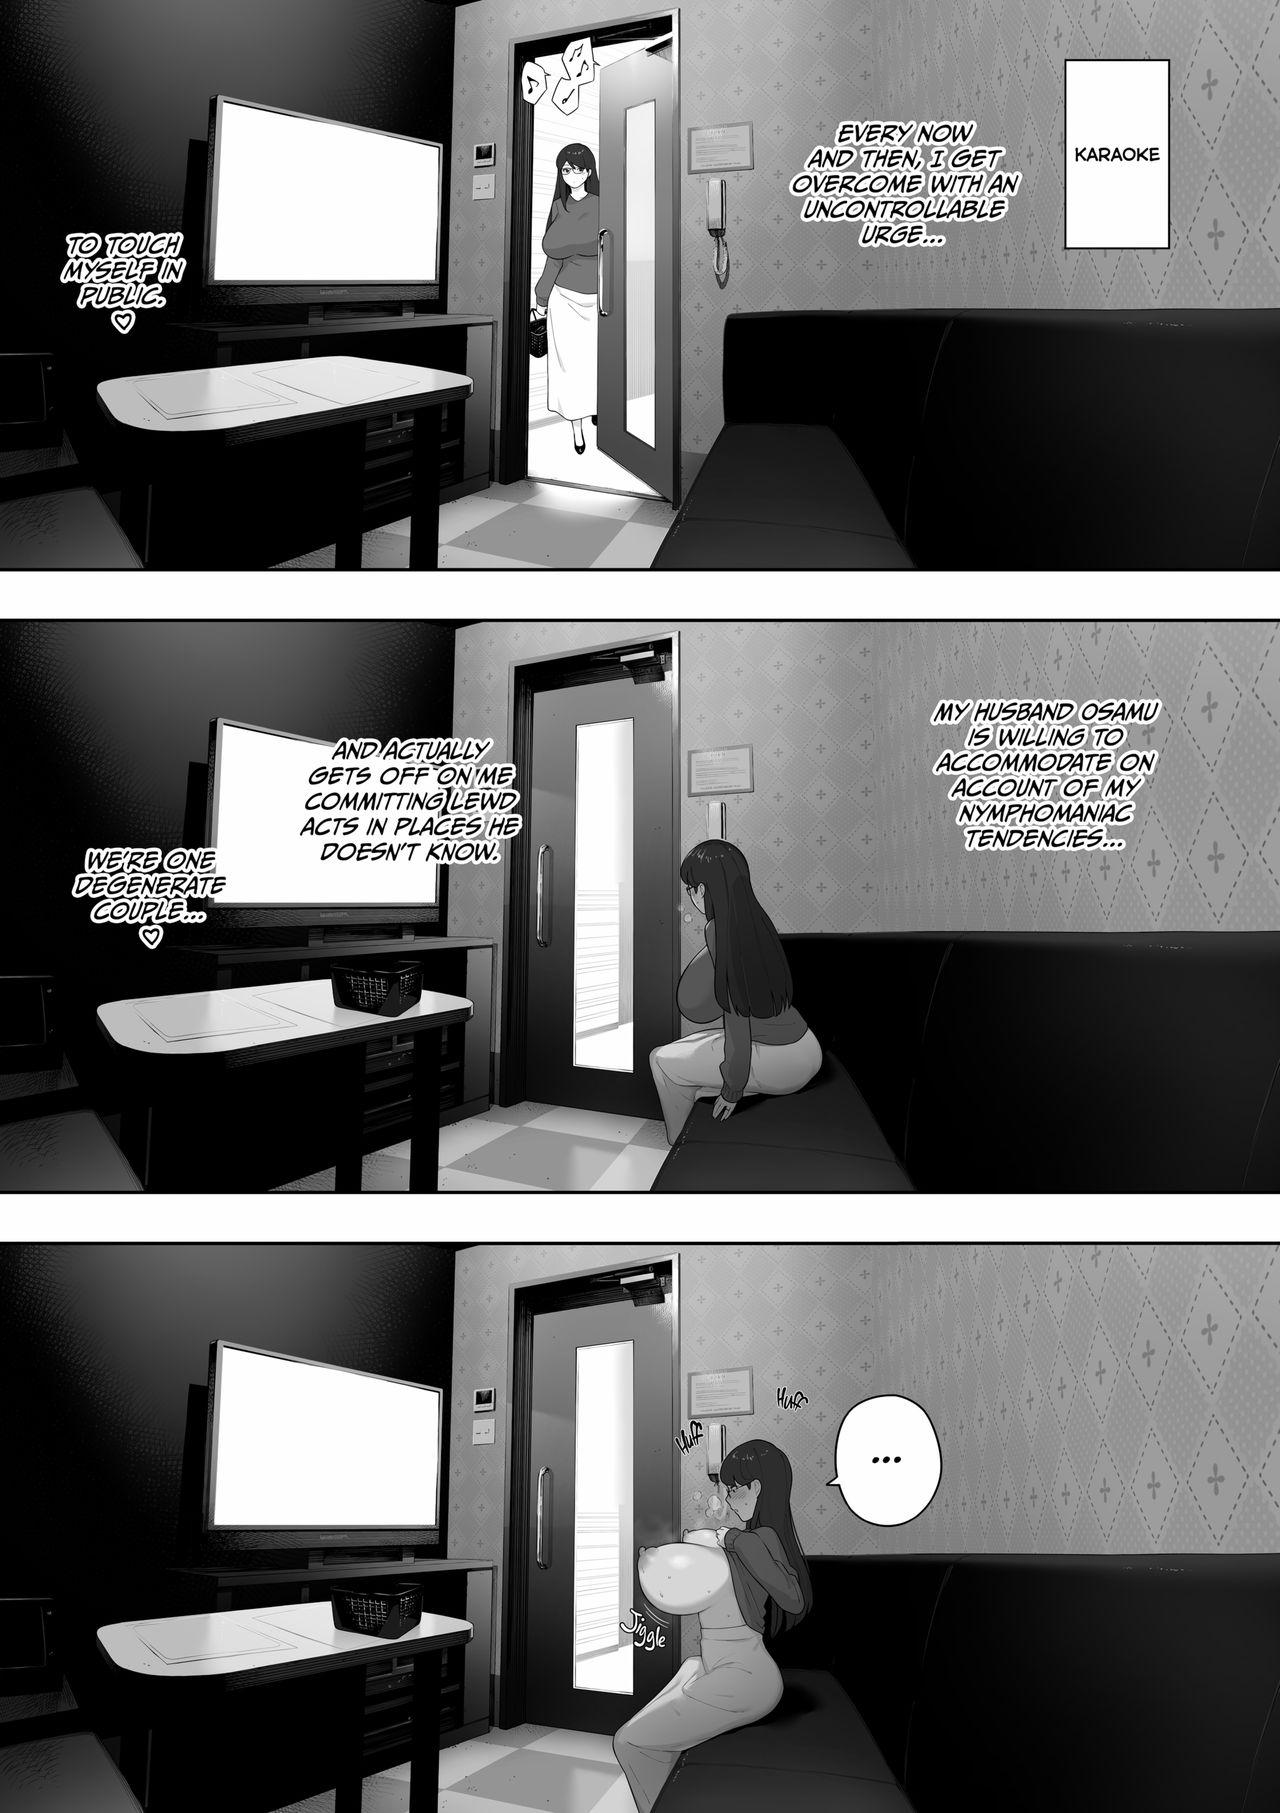 [NT Labo (NT Robo)] Aisai, Doui no Ue, Netorare Roshutsu | [NT Labo(NT Robo)] Cucked With_My Consent My Exhibitionist Wife [English] 37